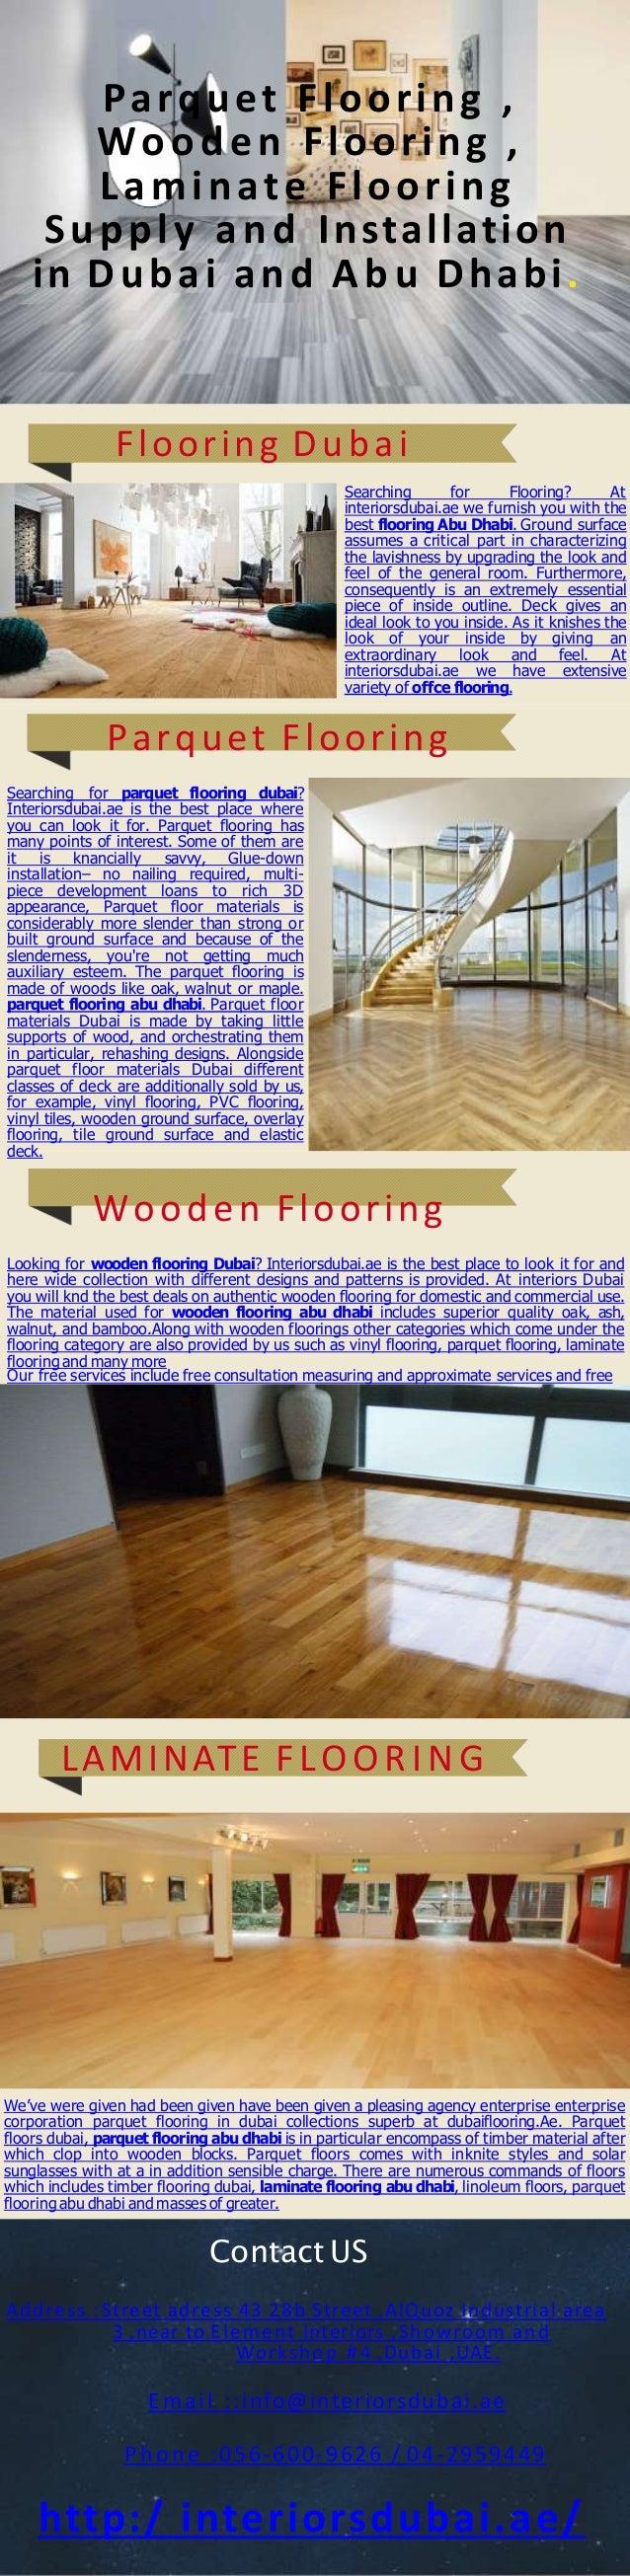 Parquet Flooring Wooden Laminate Supply And Installation In Dubai A B U